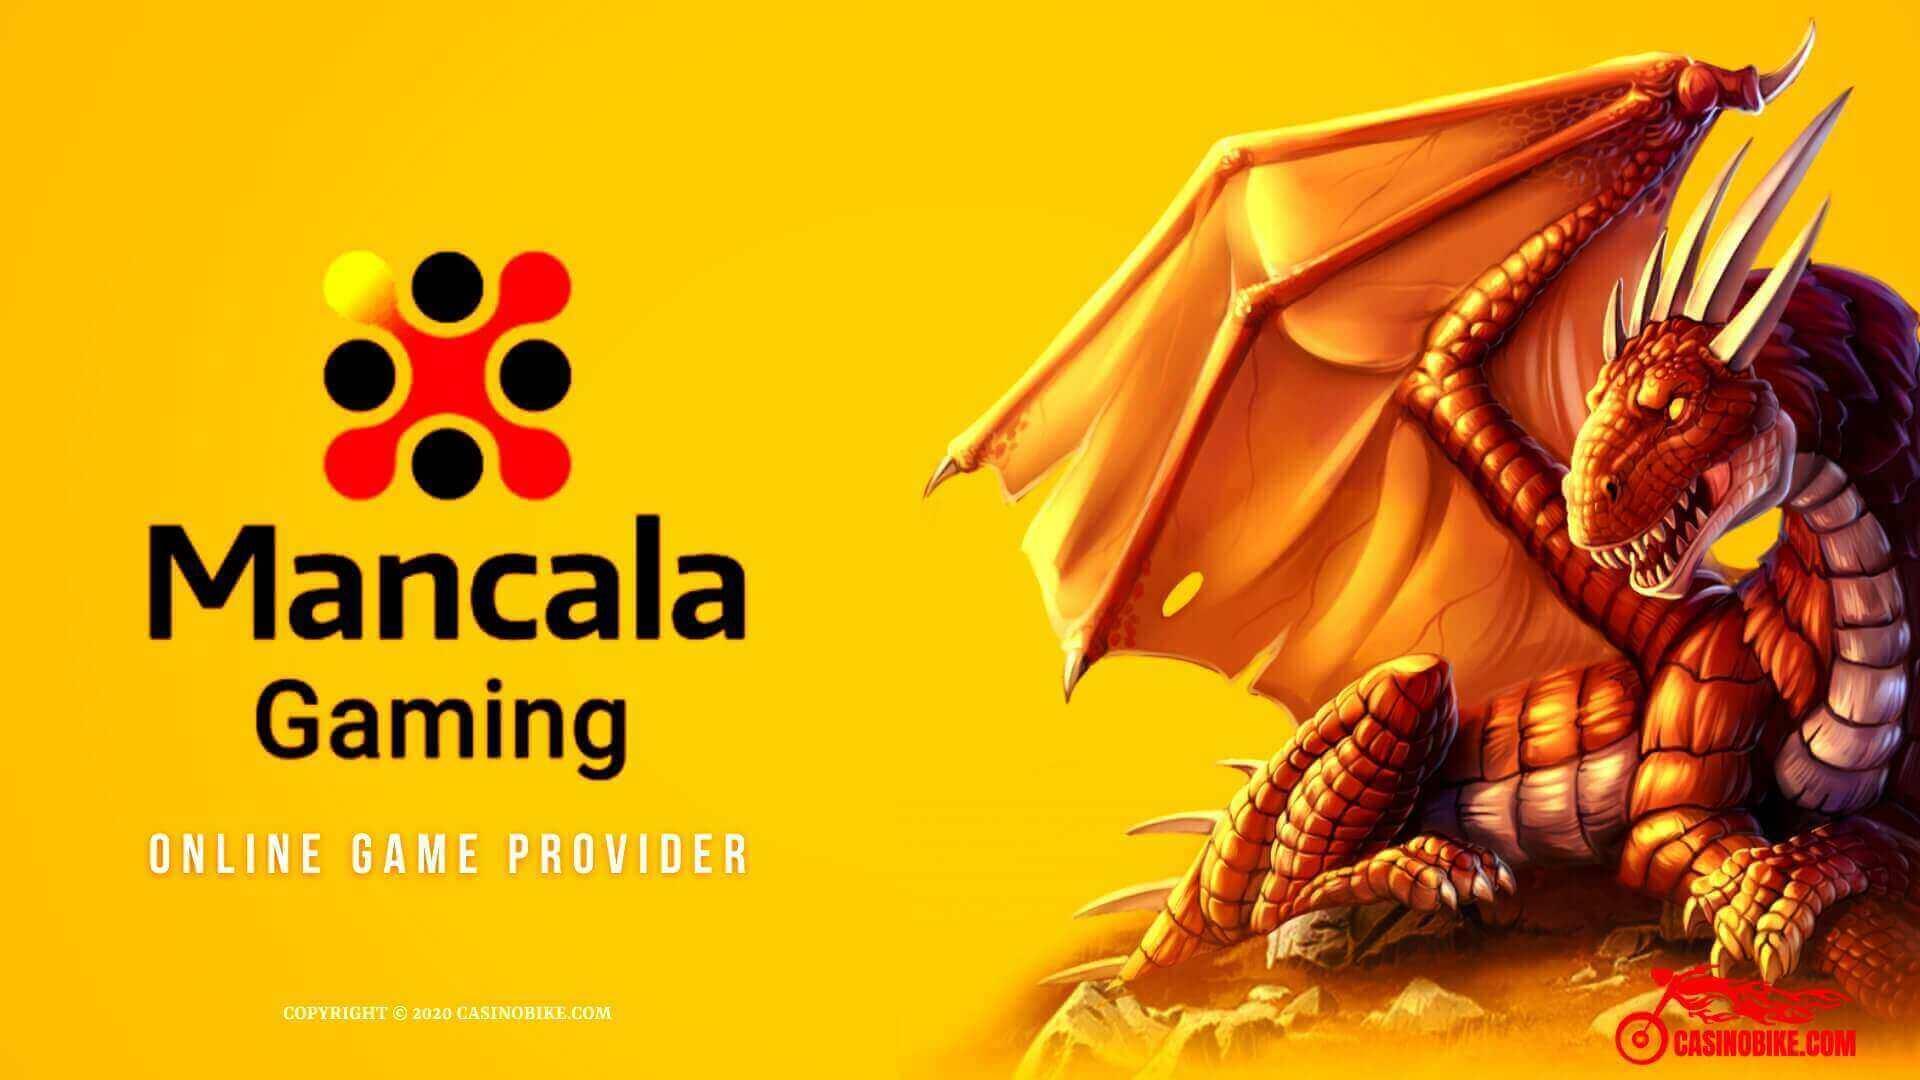 Mancala Gaming Online Slot Game Provider